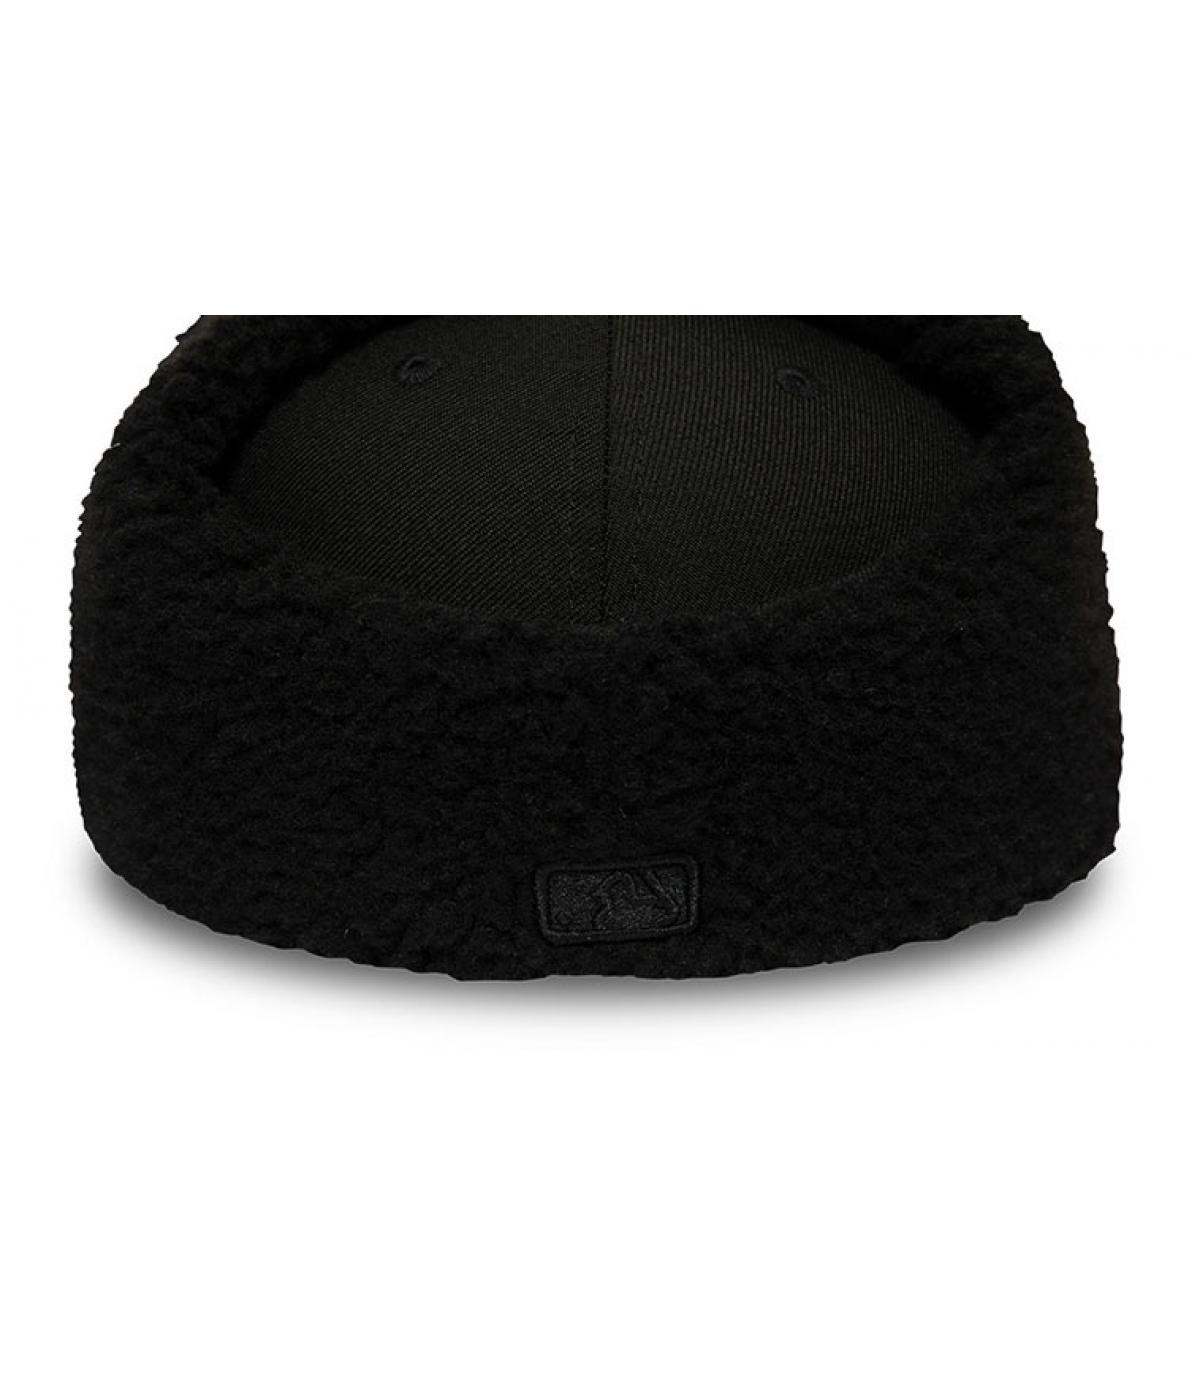 Details Cap League Ess Dogear NY 5950 black black - Abbildung 4